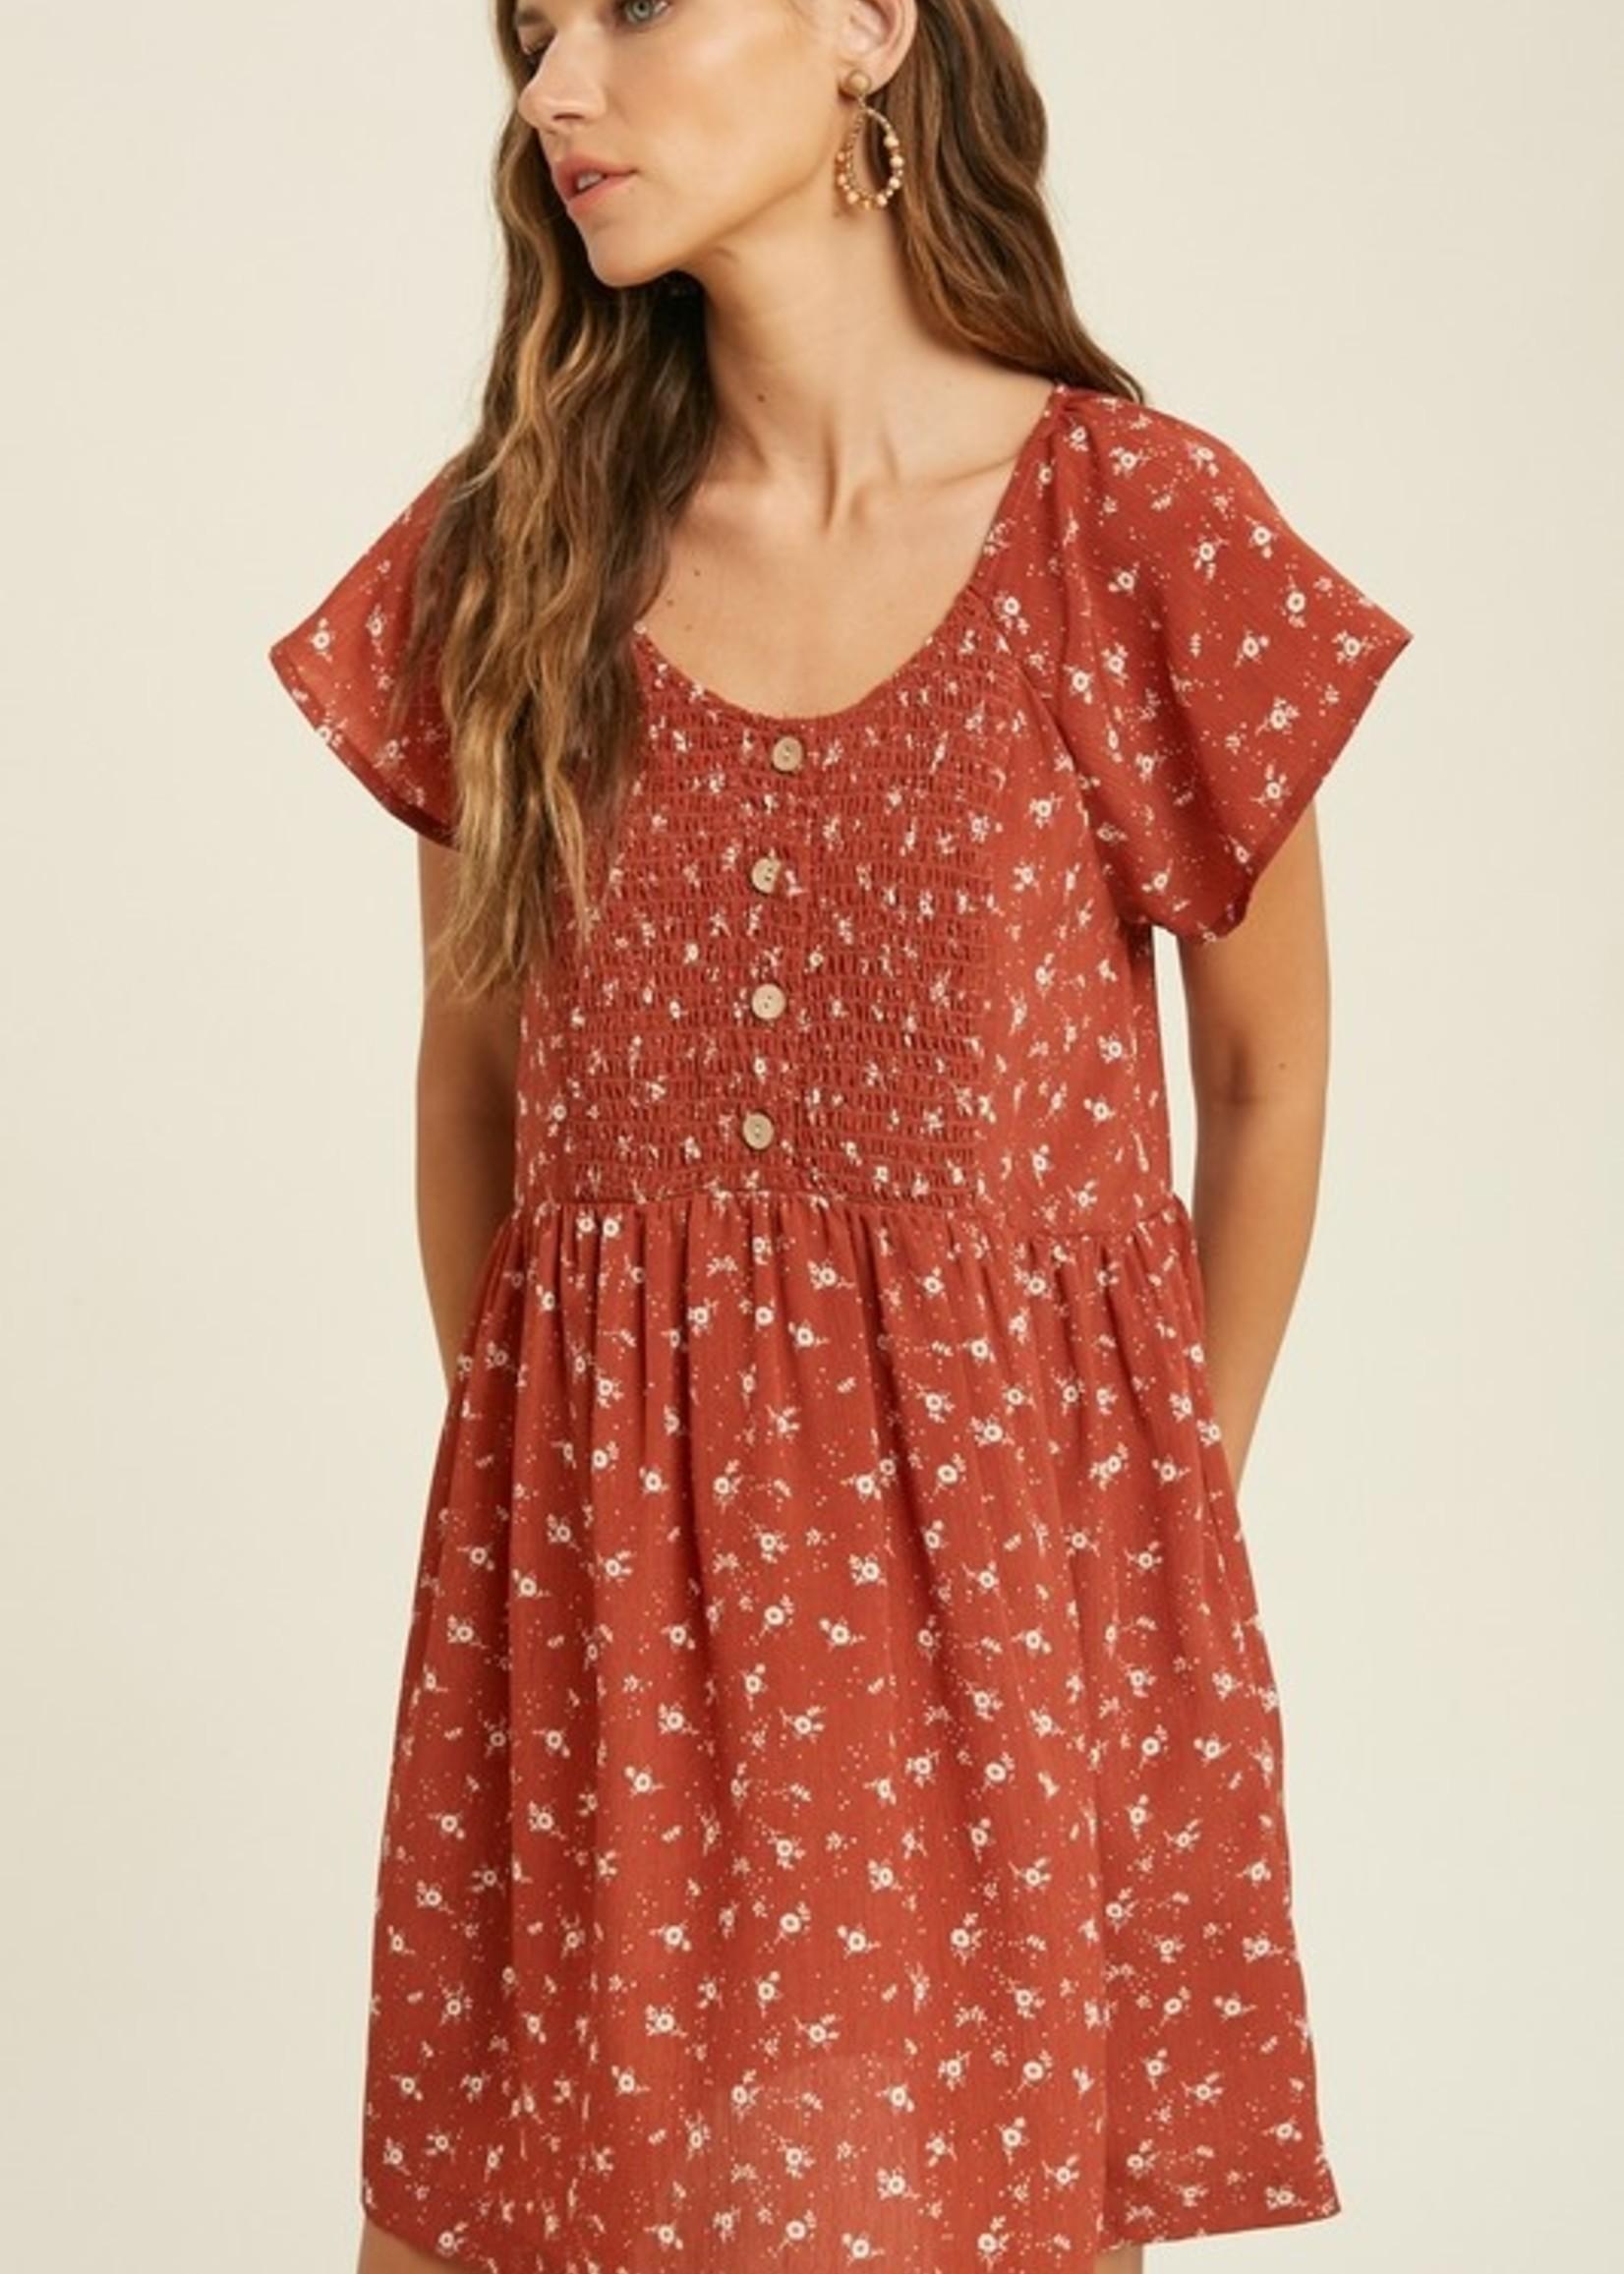 Floral Smocked Dress - Rust